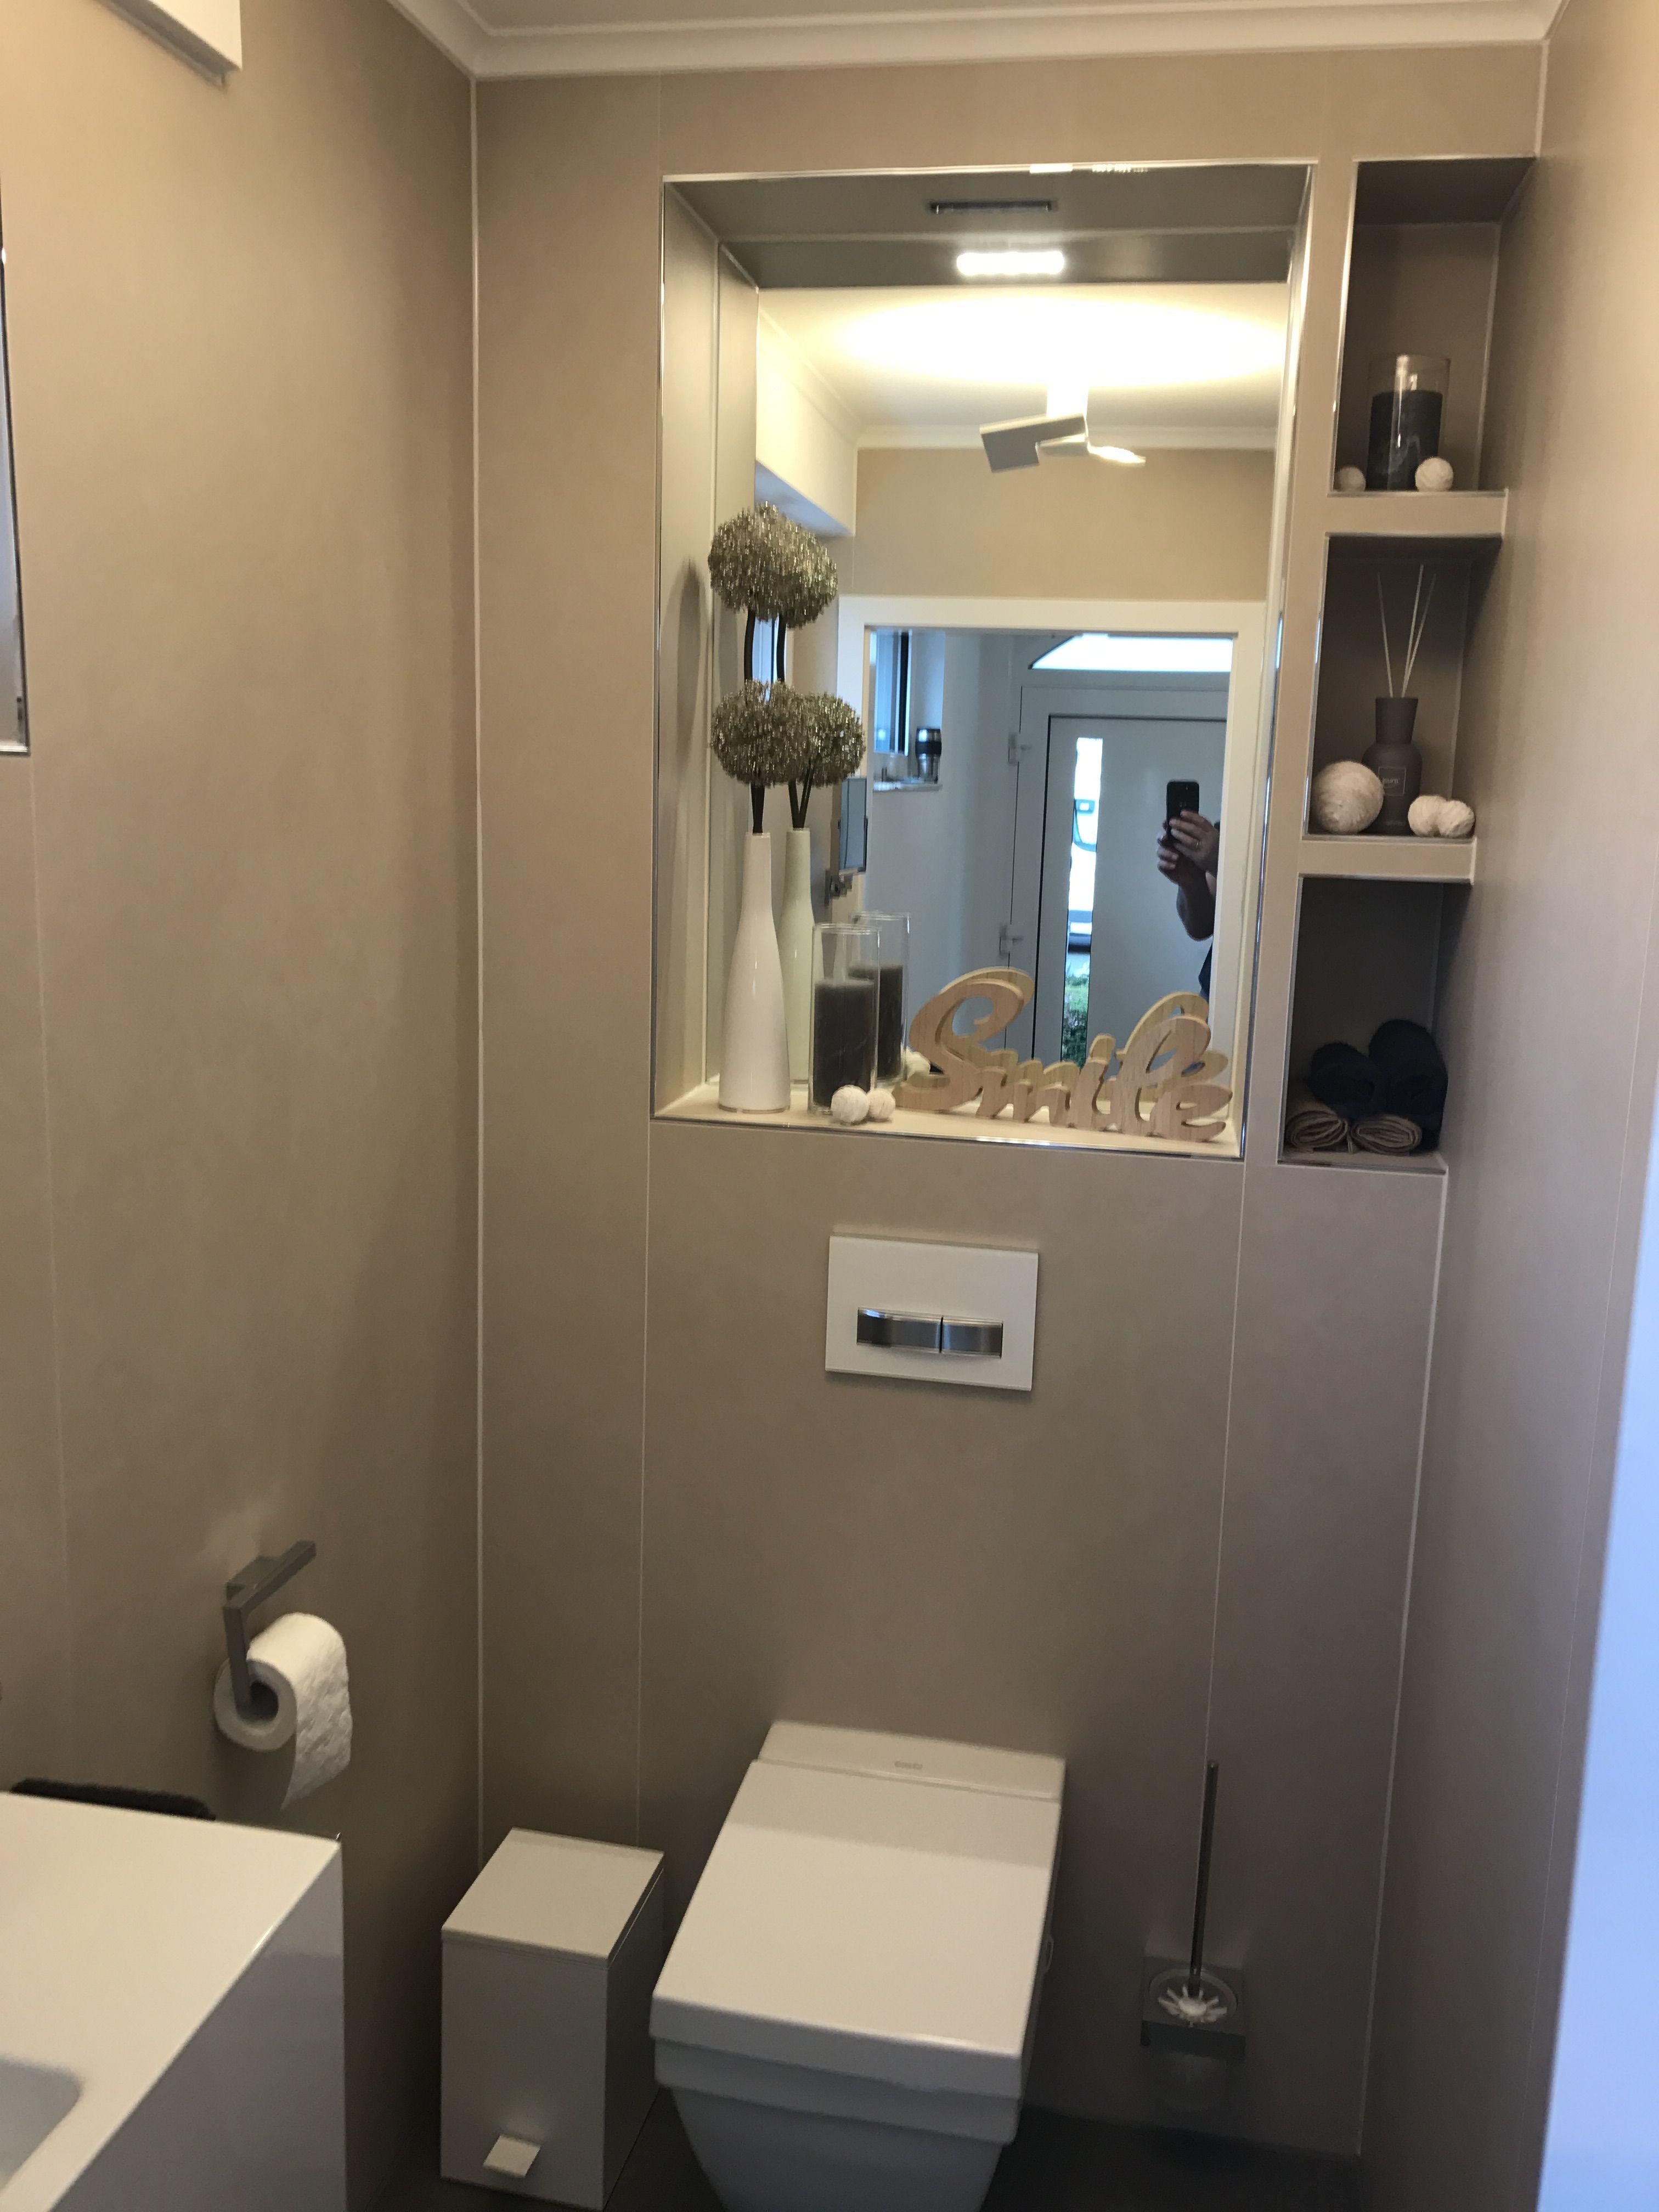 Badezimmerdesign mit jacuzzi pin by fliesen weger on bad ideen  pinterest